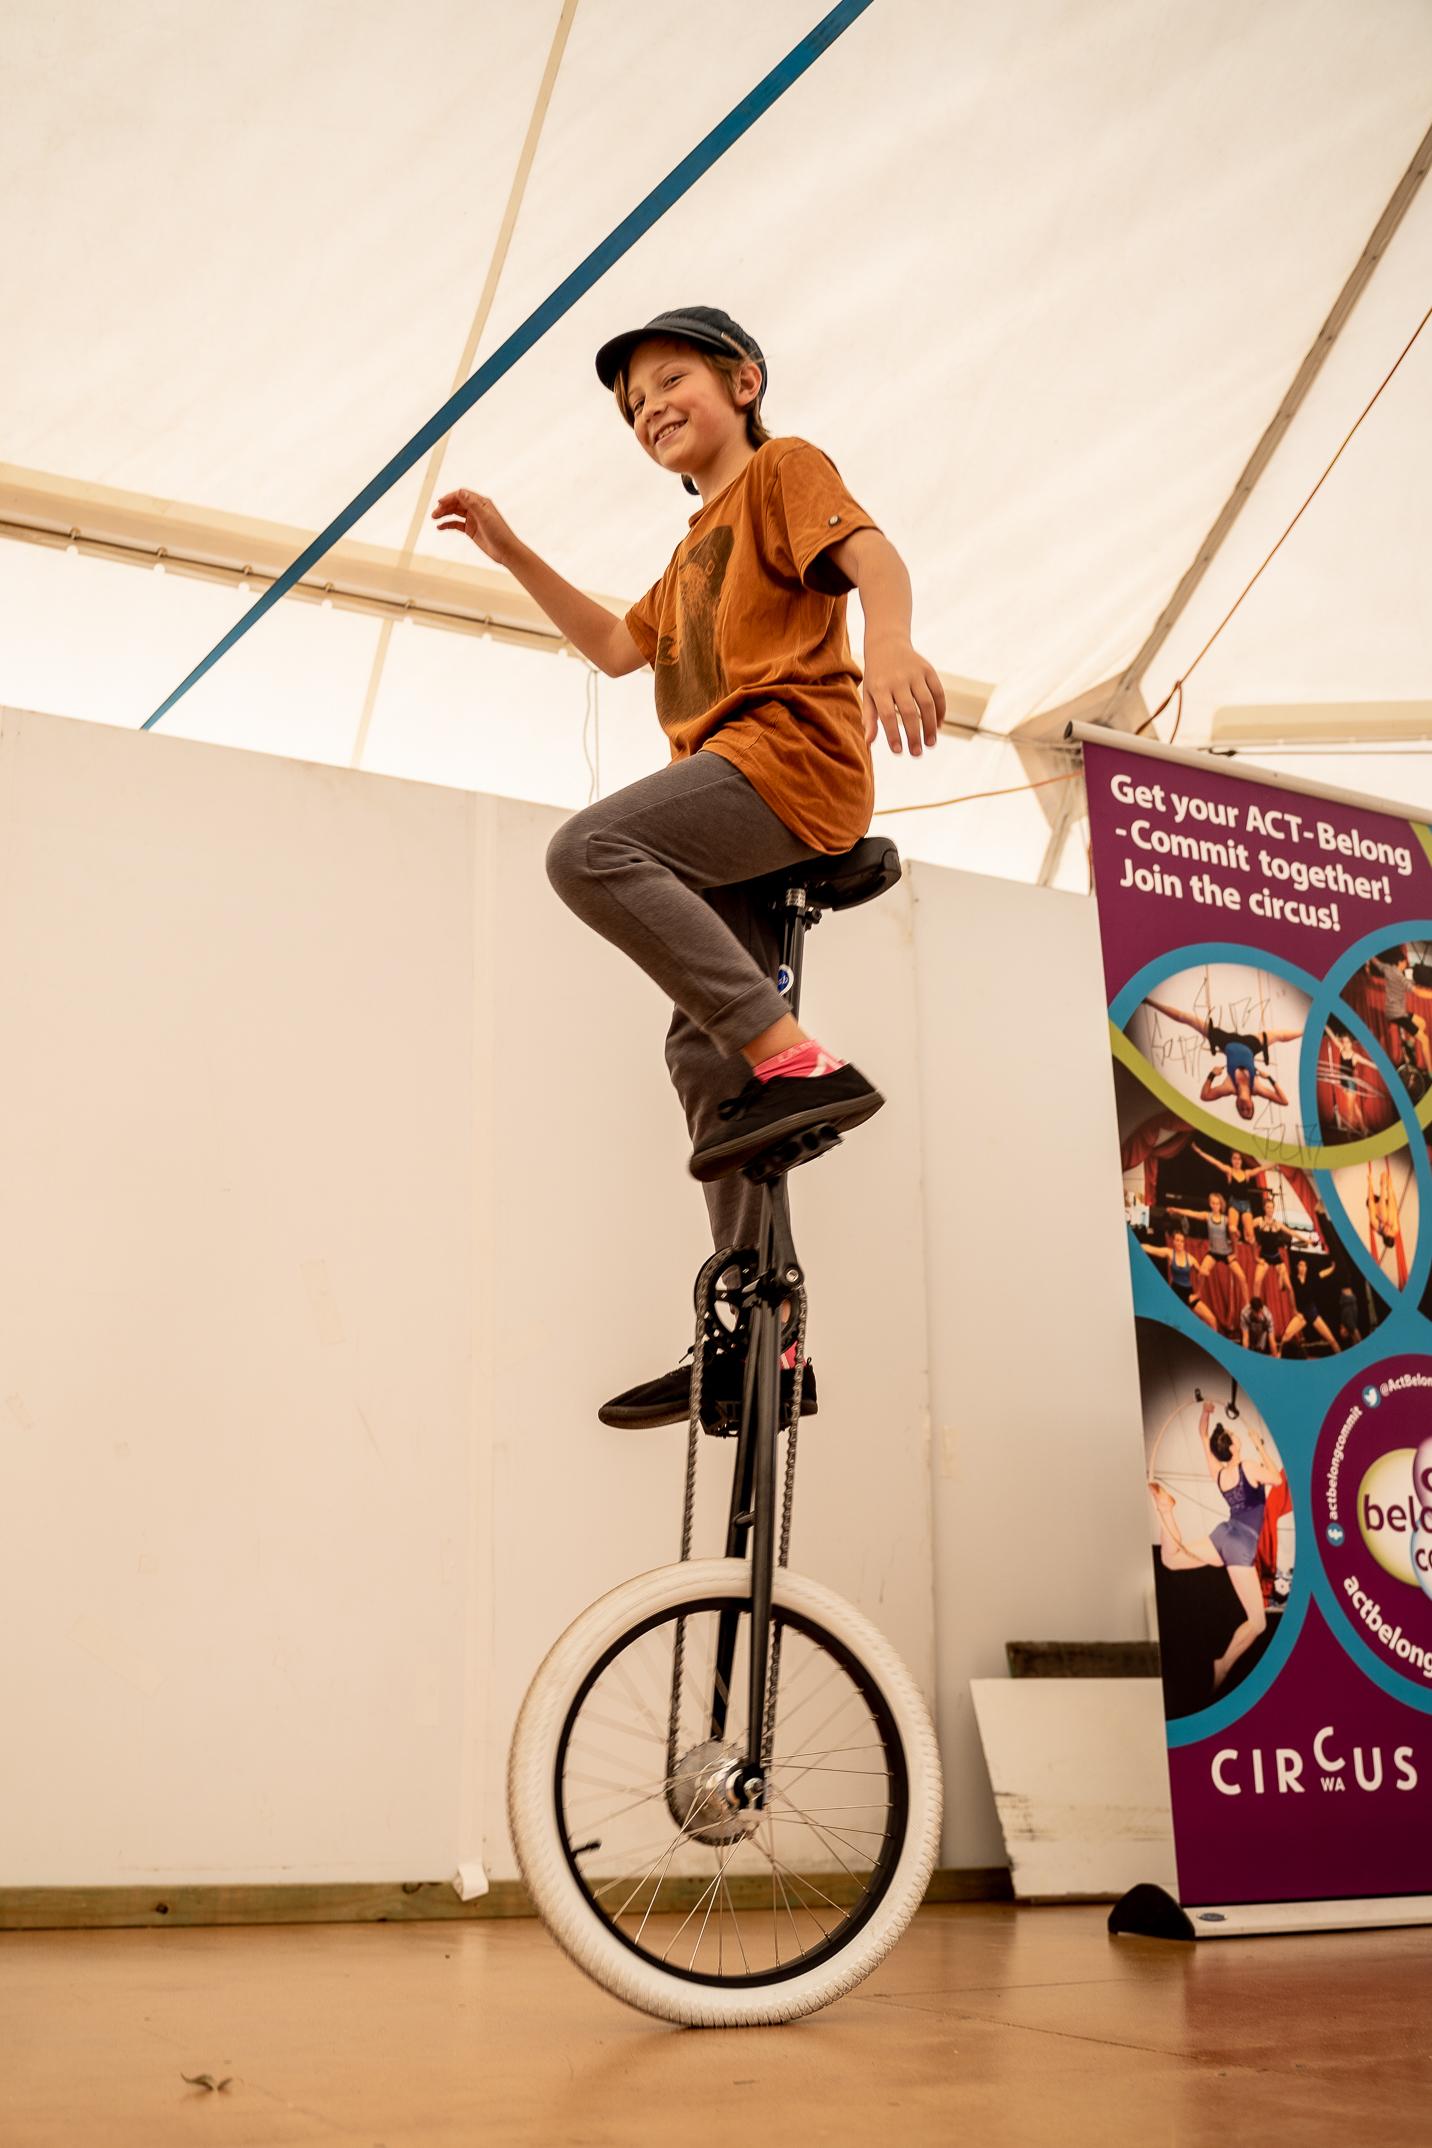 A boy rides a giraffe unicycle